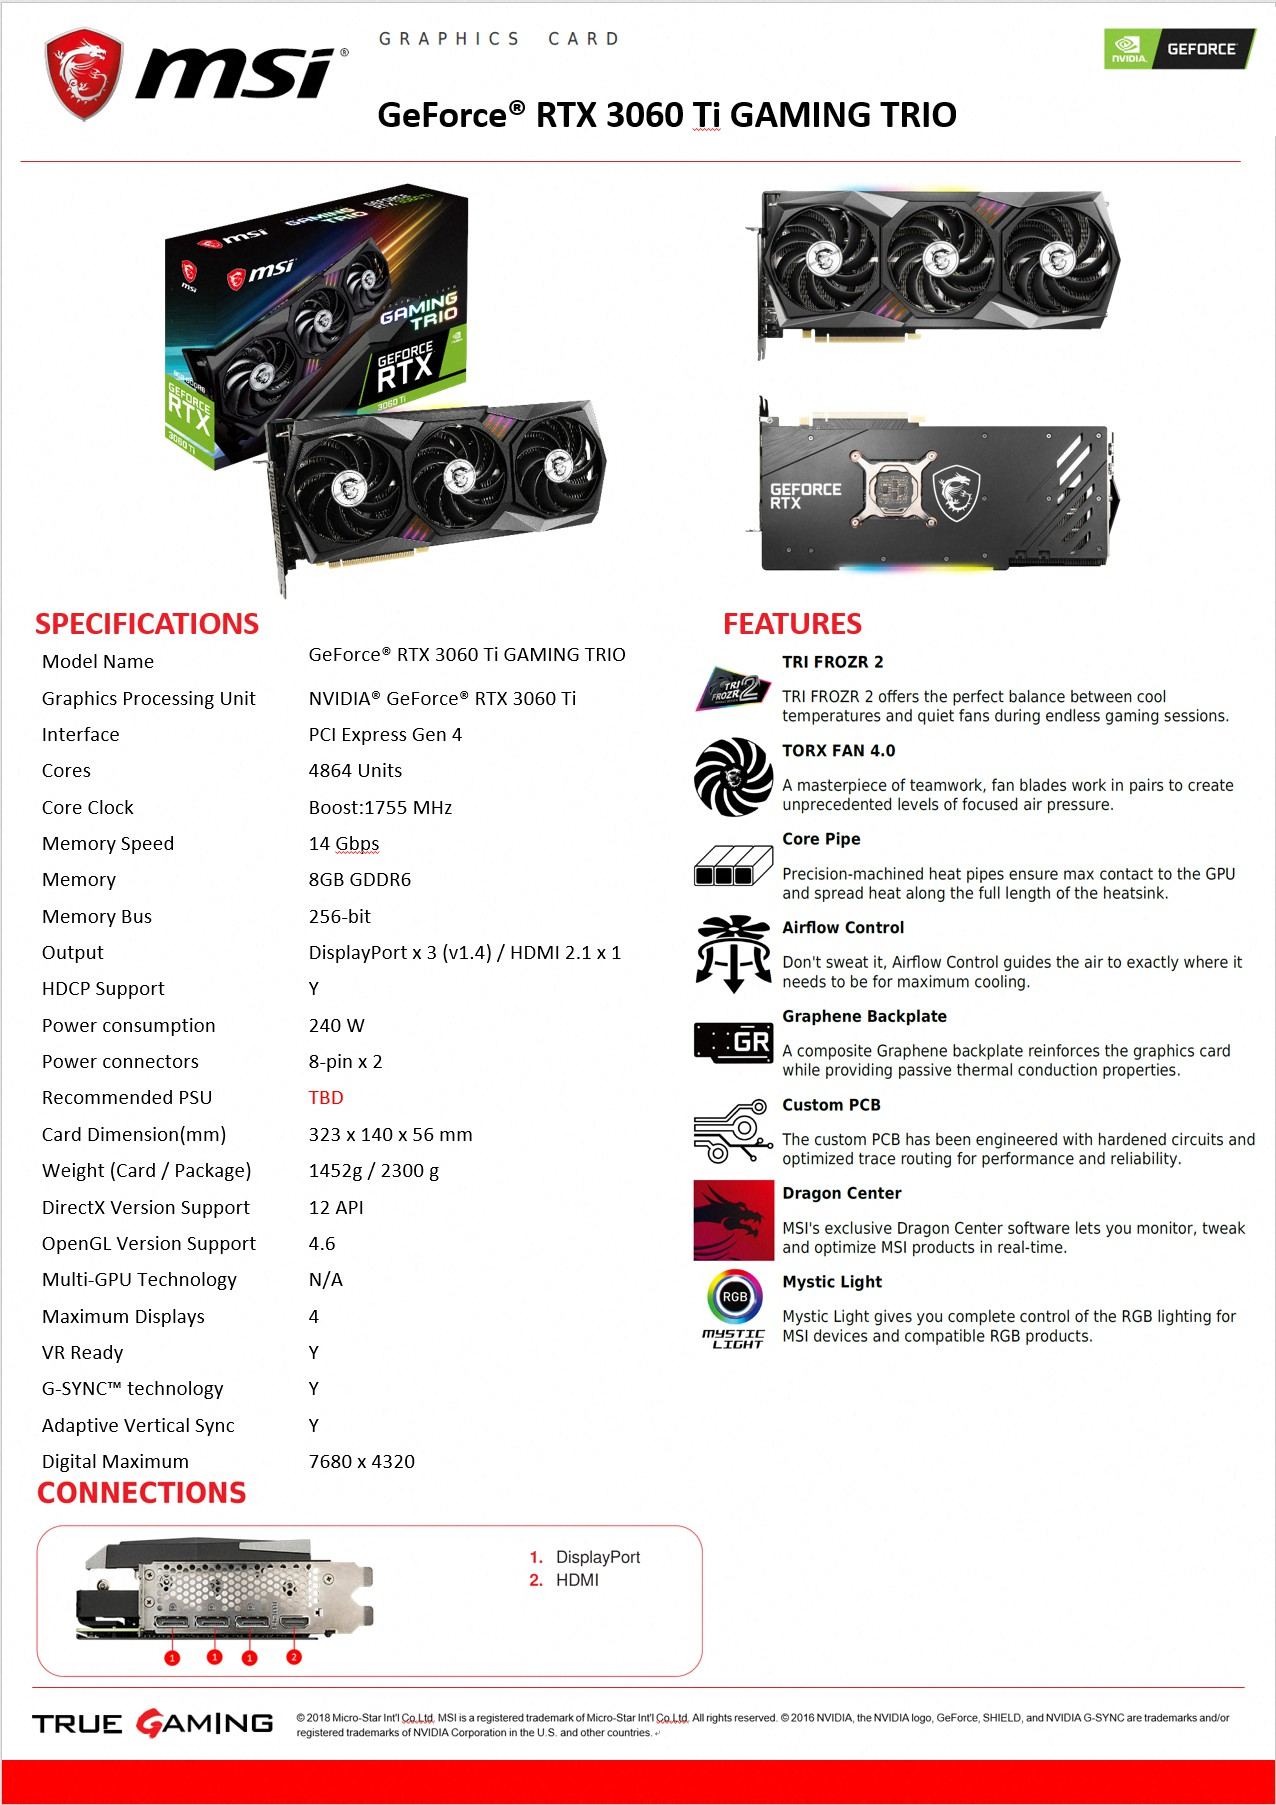 msi-geforce-rtx-3060-ti-gaming-trio-datasheet